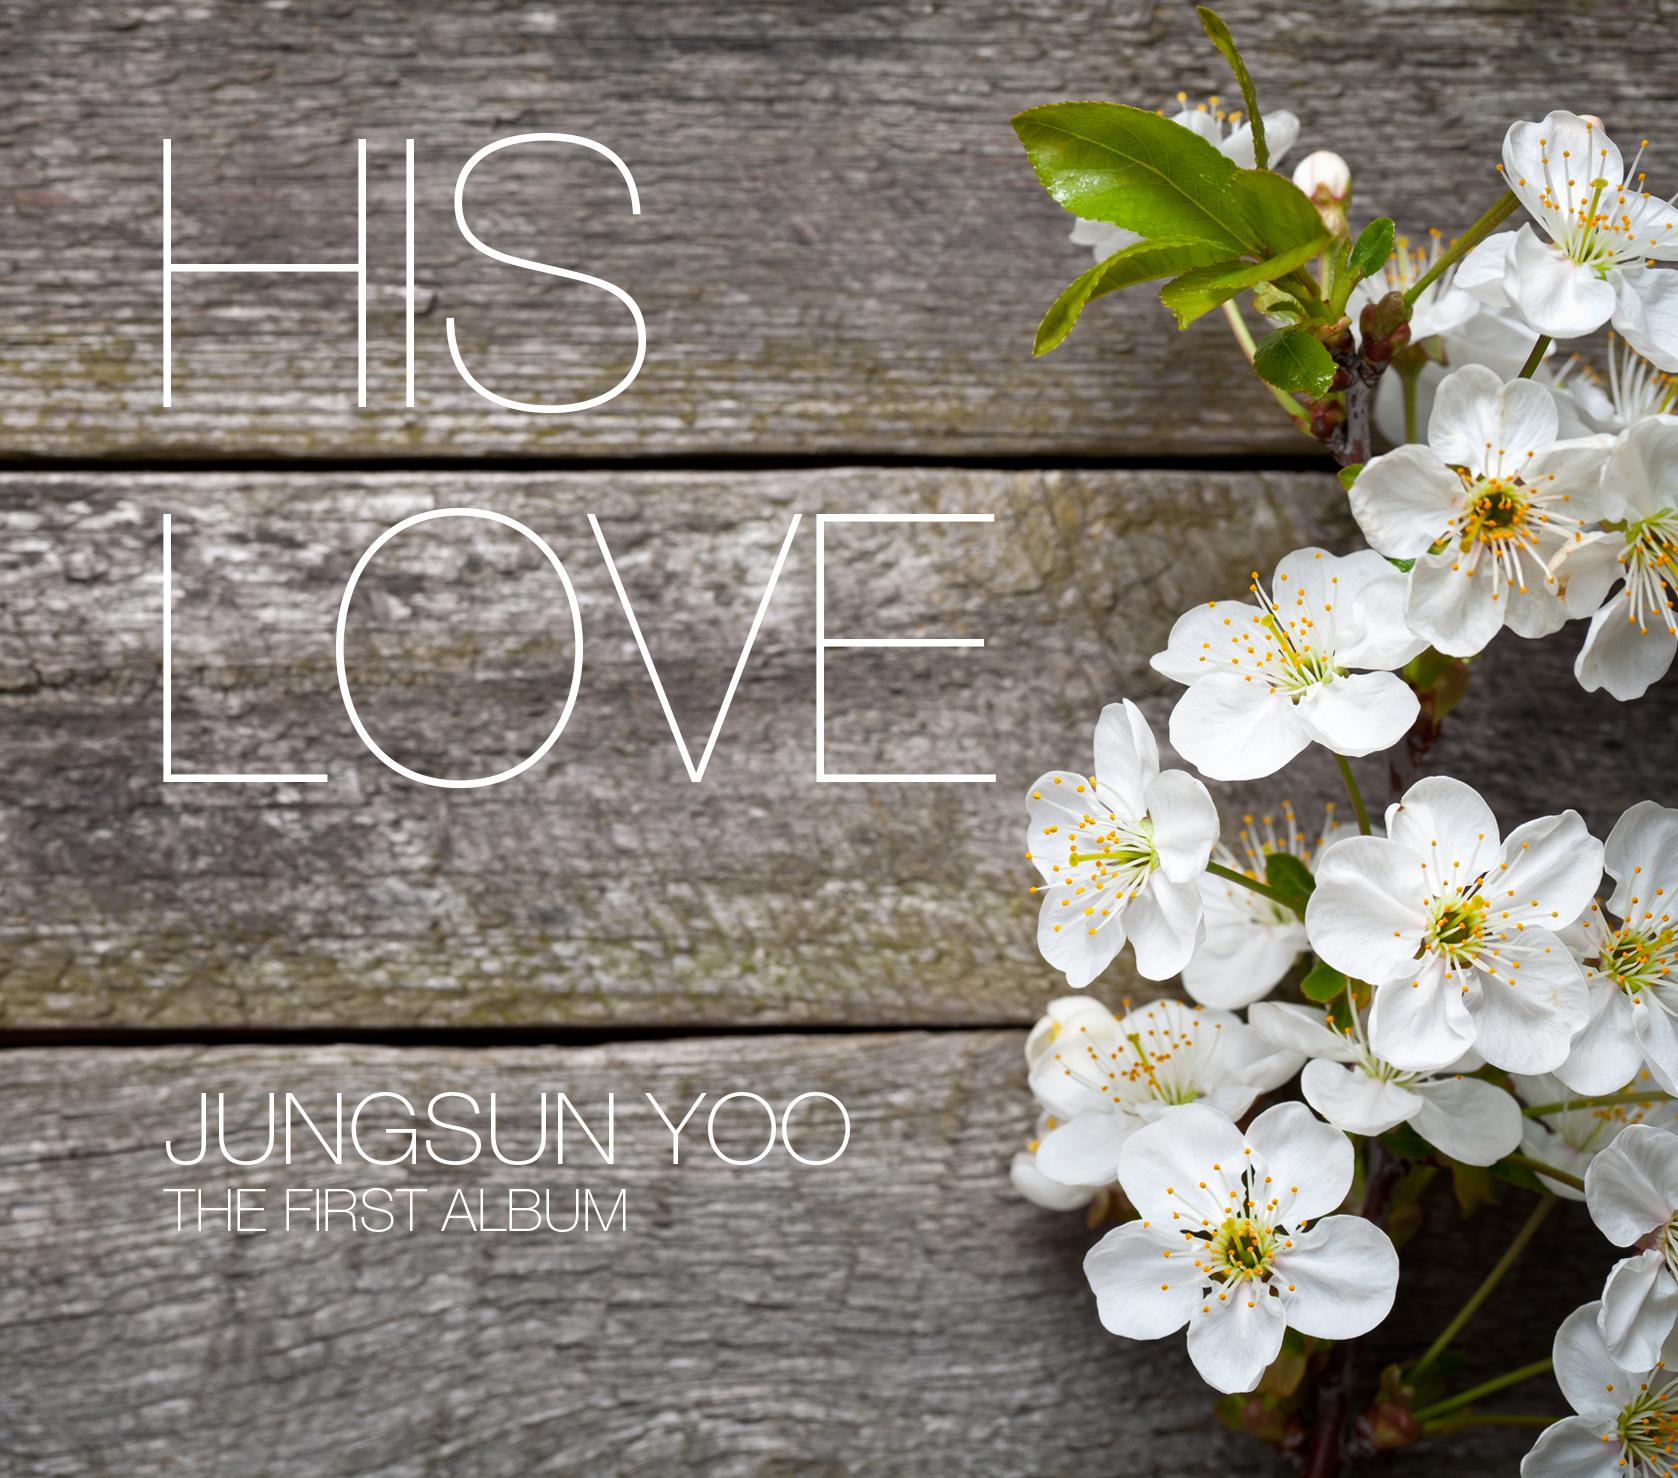 Yoo Jeong-seon-Vol. 1 [HIS LOVE]